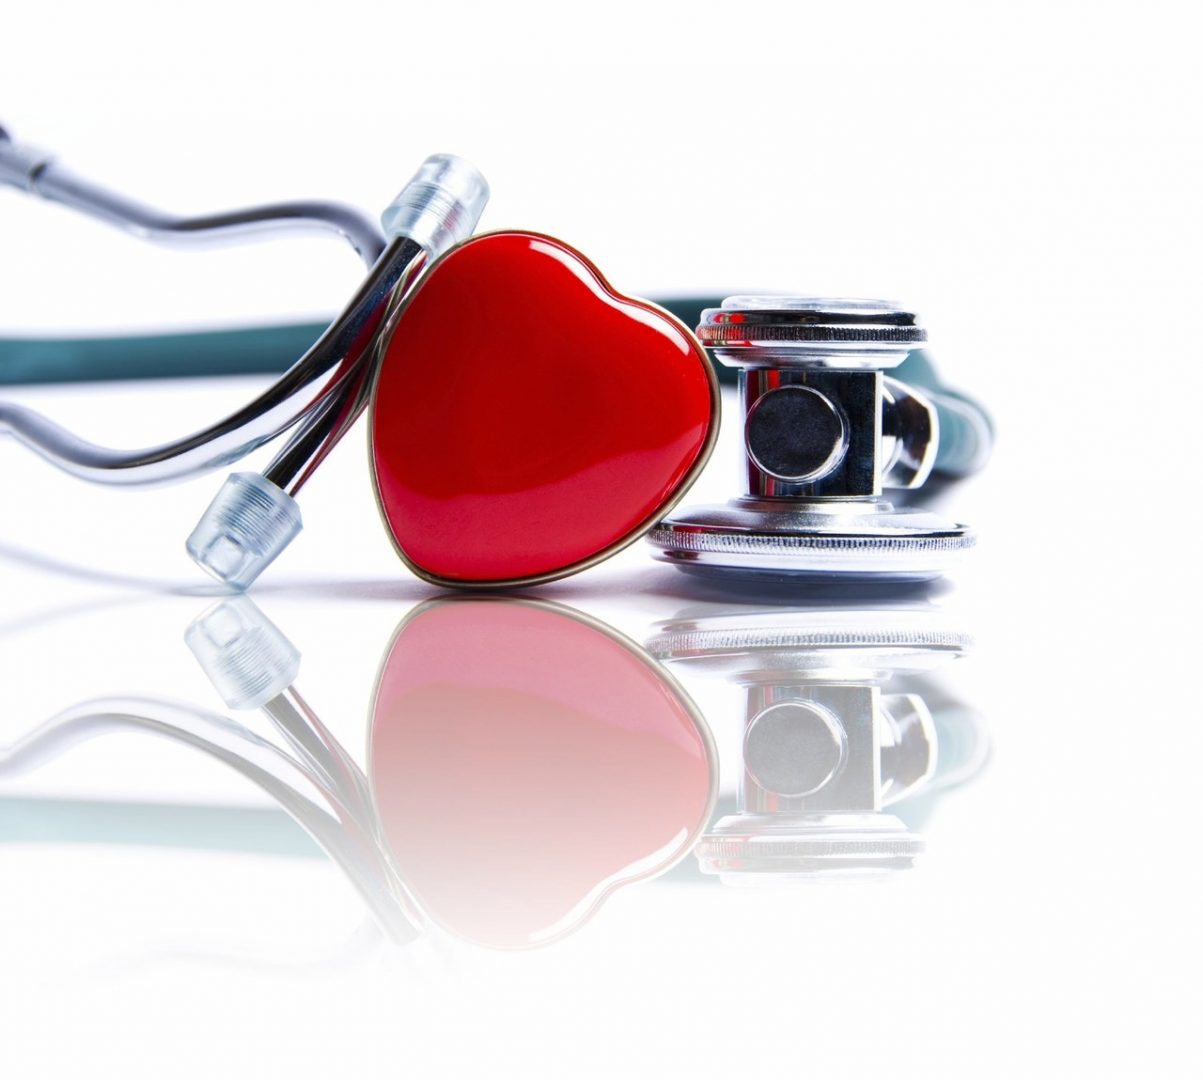 Dobrovoljno Zdravstveno Osiguranje – Vodič Za Firme